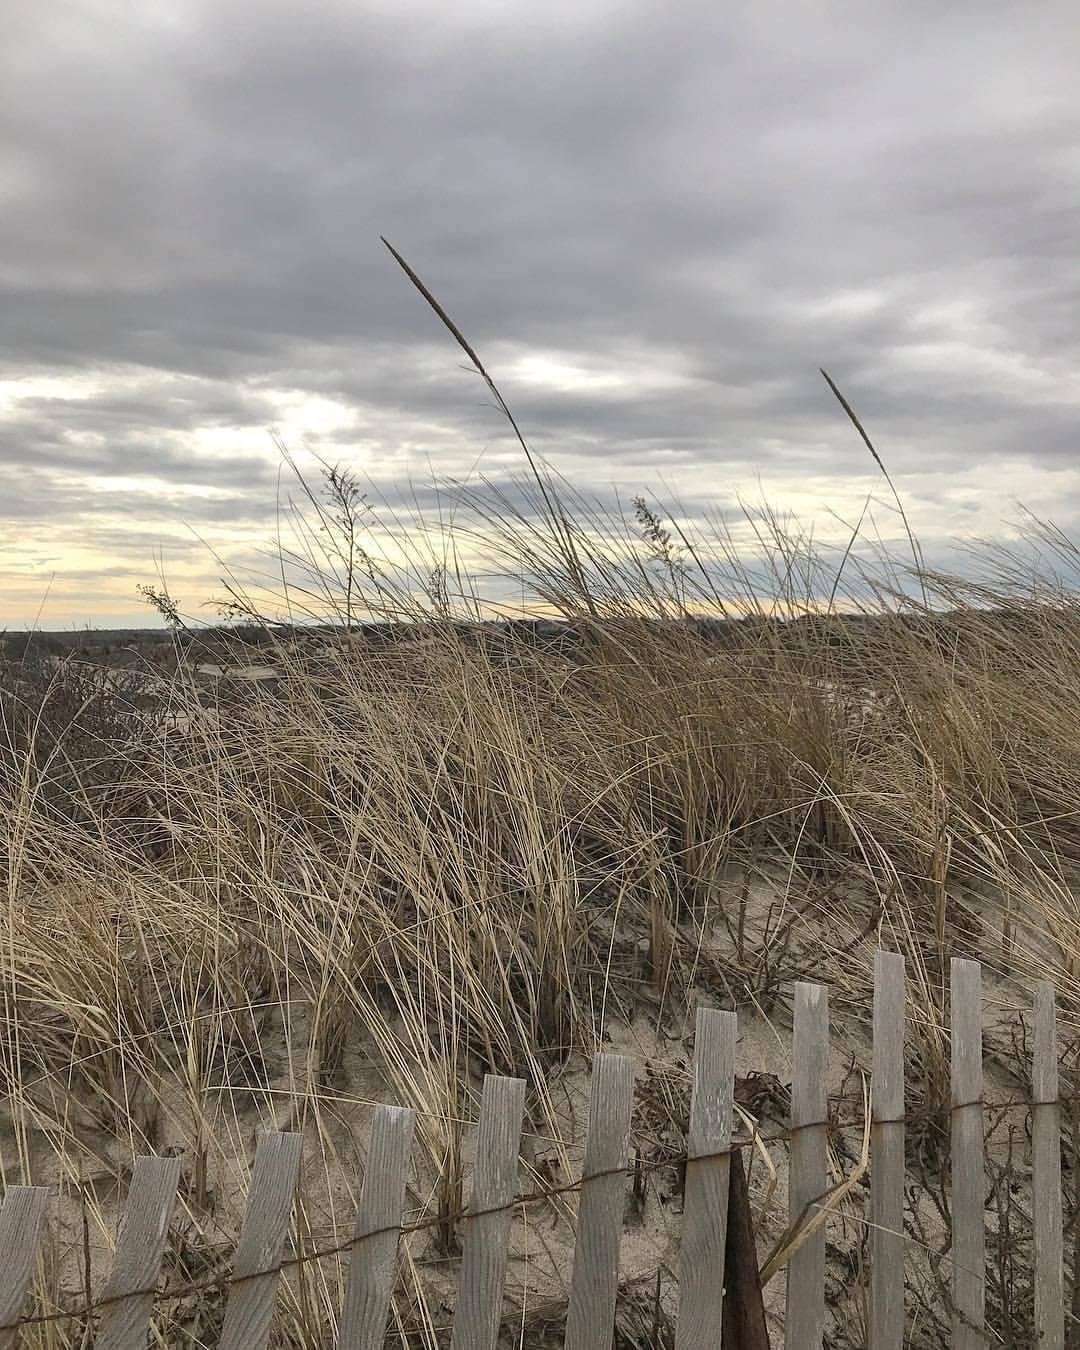 Sandy Neck.  -  #massachusetts #capecod #tripdownmemorylane  (at Cape Cod Bay)